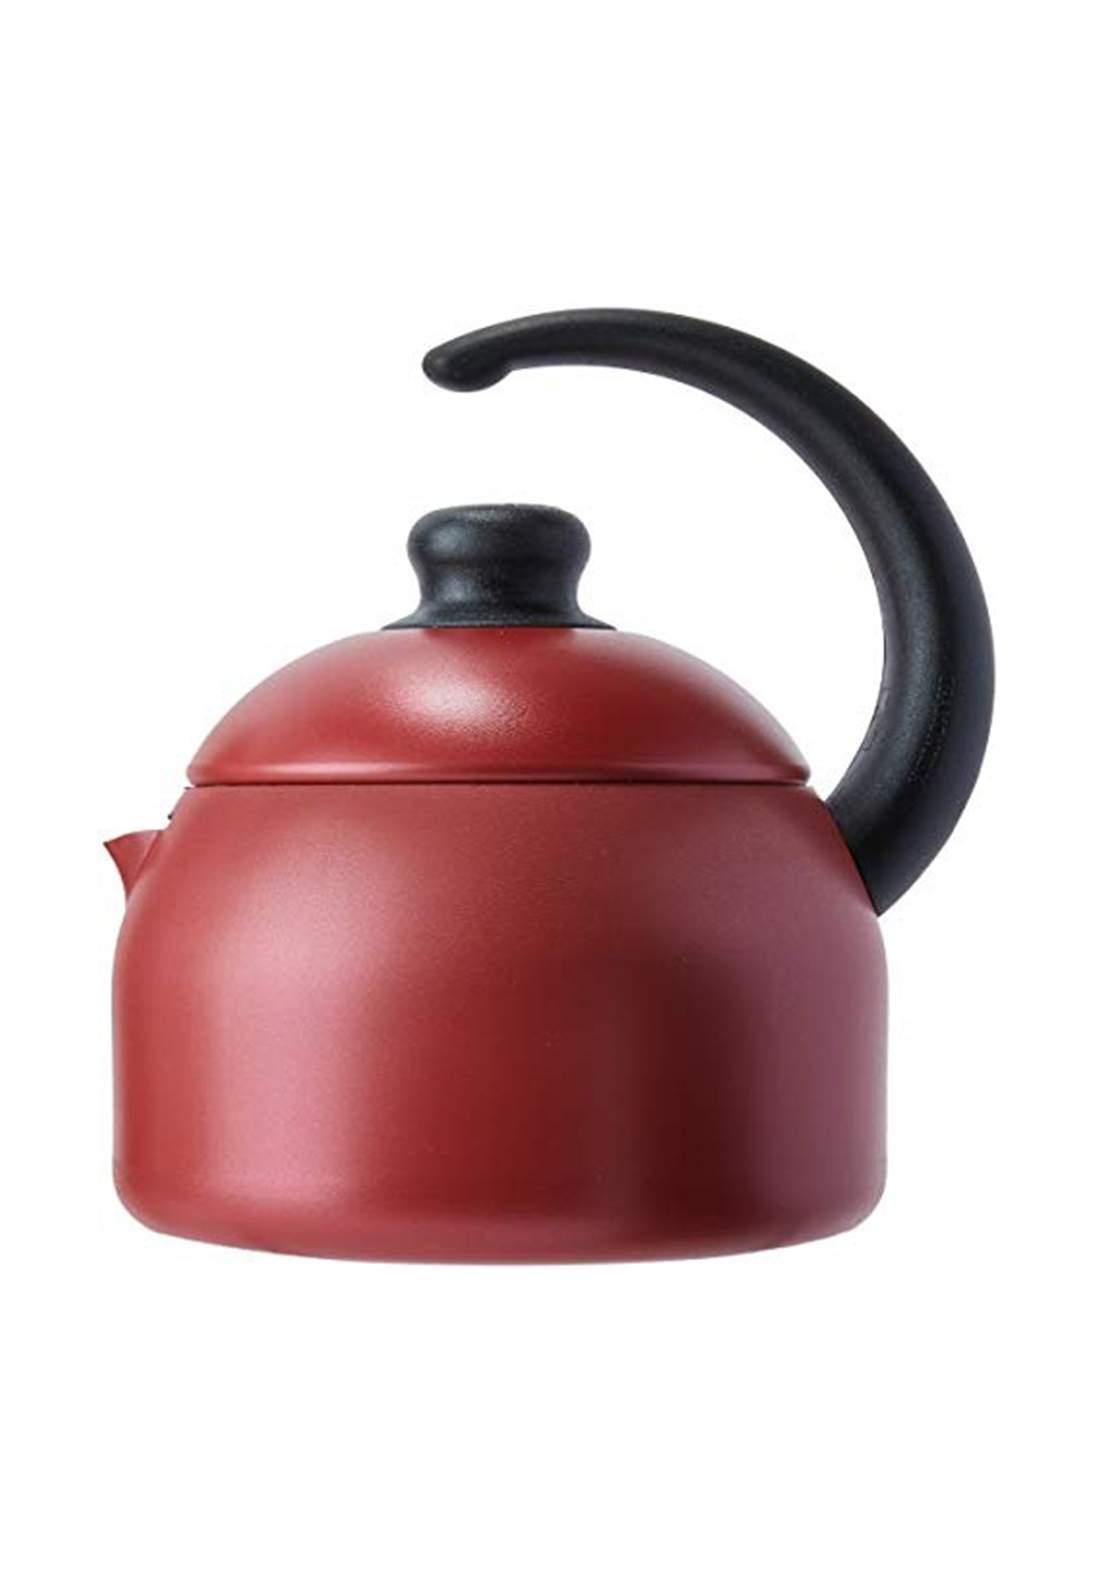 Tramontina '20550-719 Teapot 1.9 L Red ابريق شاي